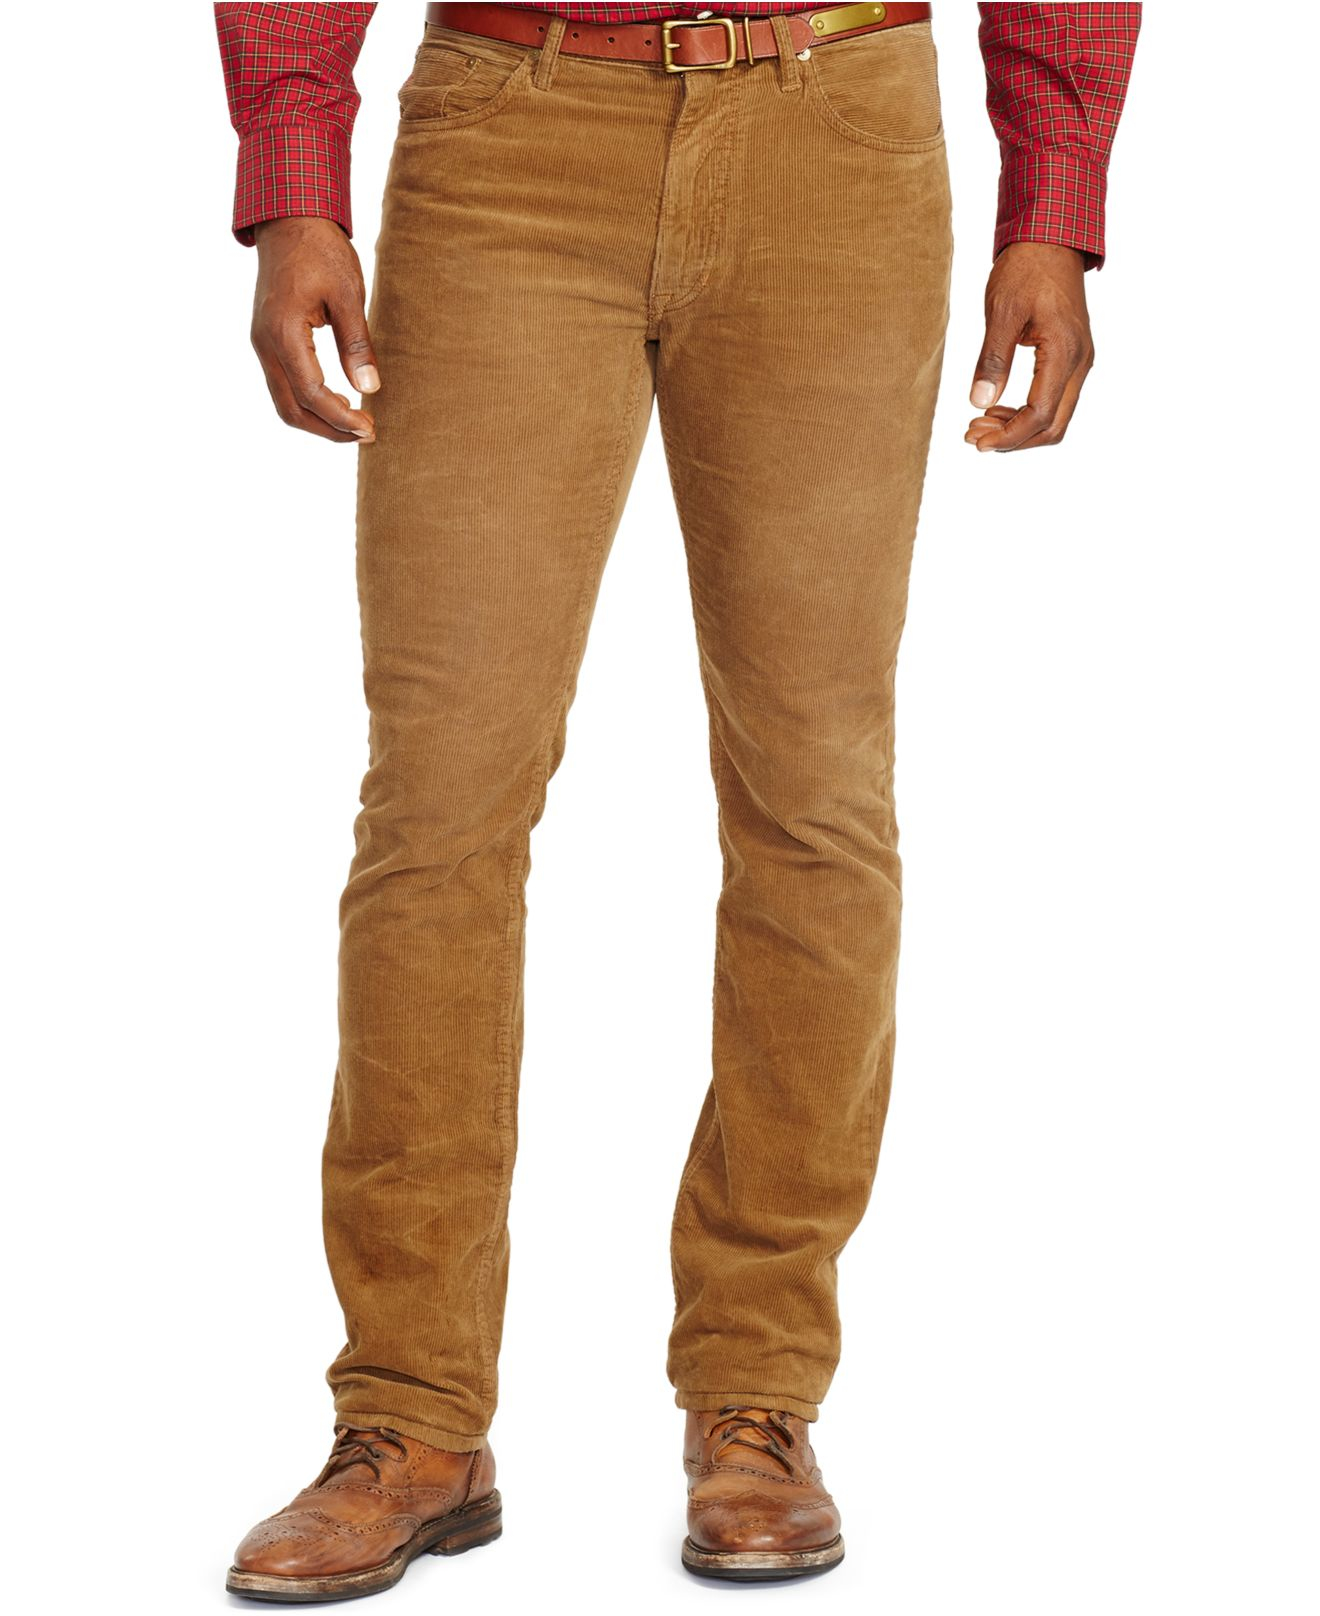 Mens Jeans 44x34